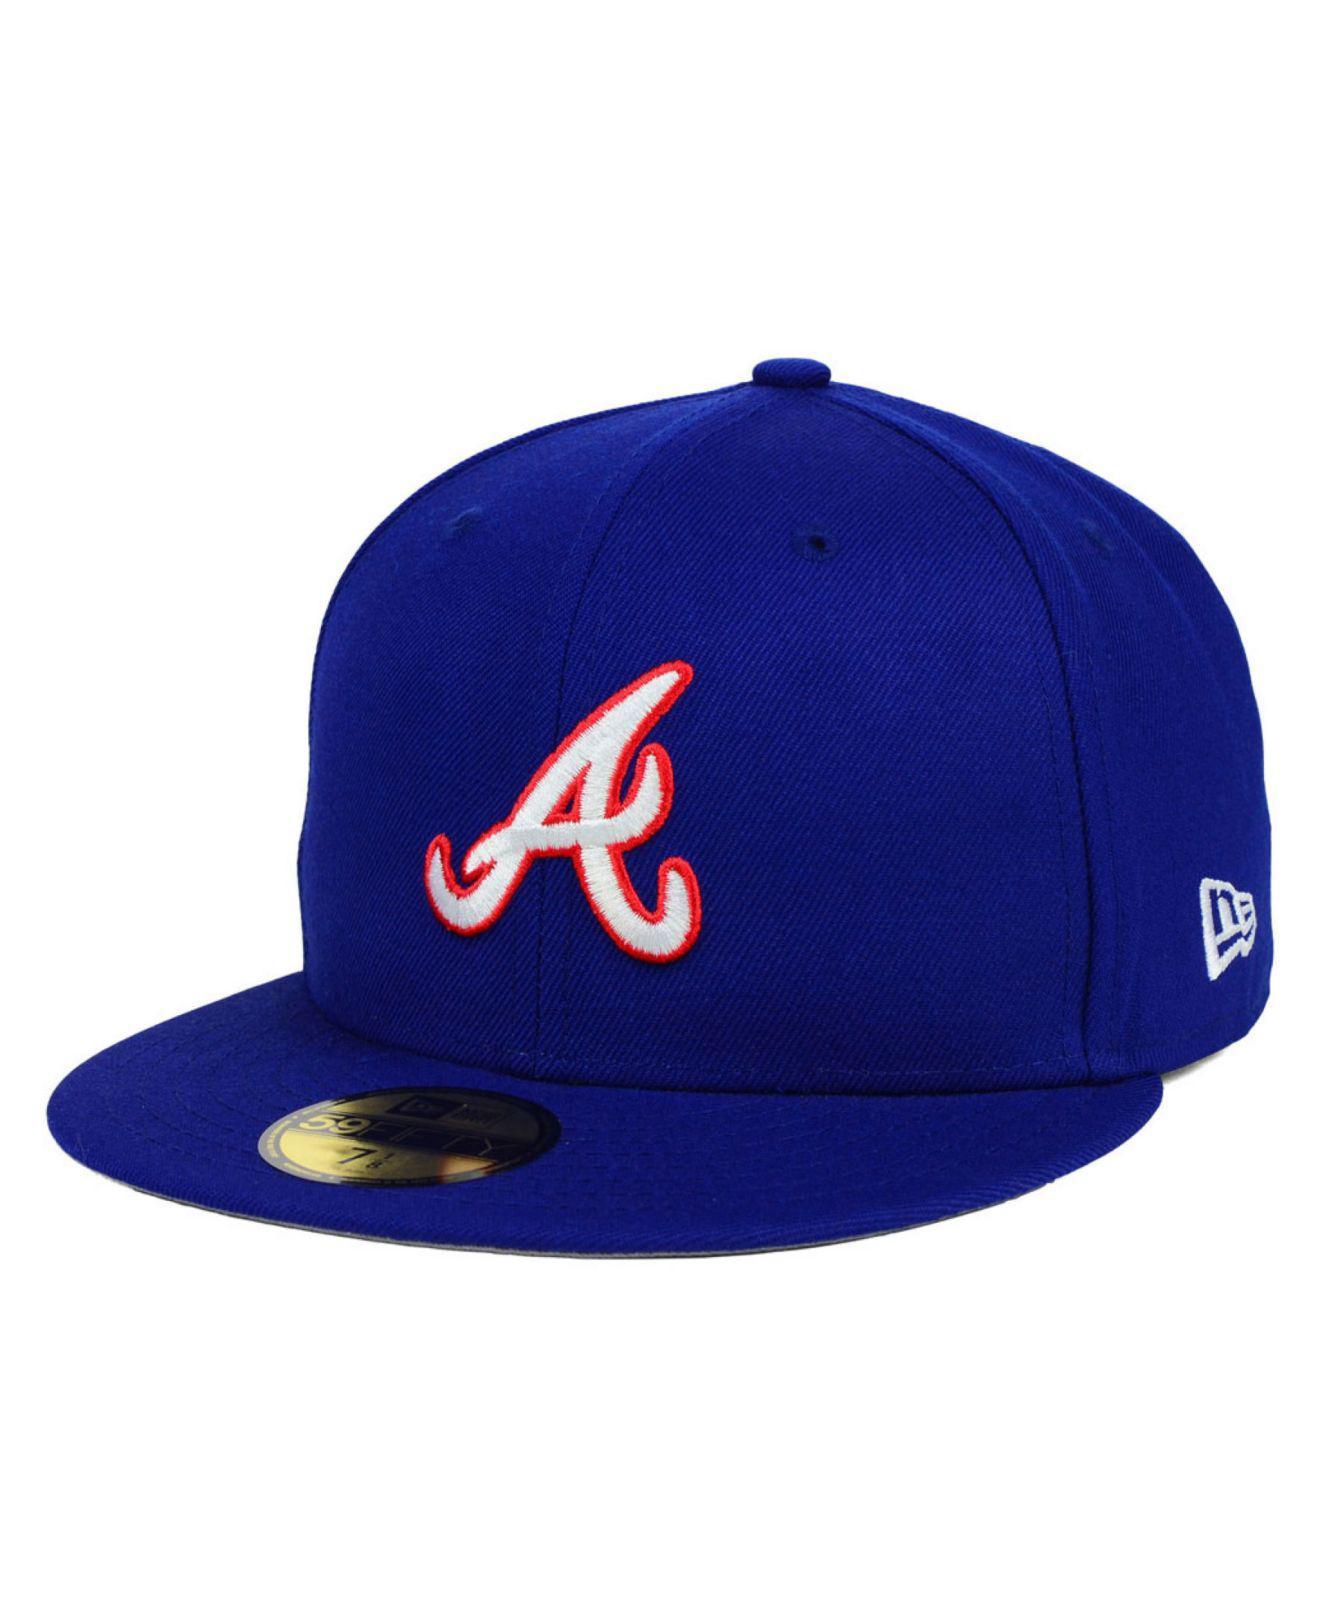 new concept 4ebea df76a KTZ. Men s Blue Atlanta Braves Mlb Cooperstown 59fifty Cap